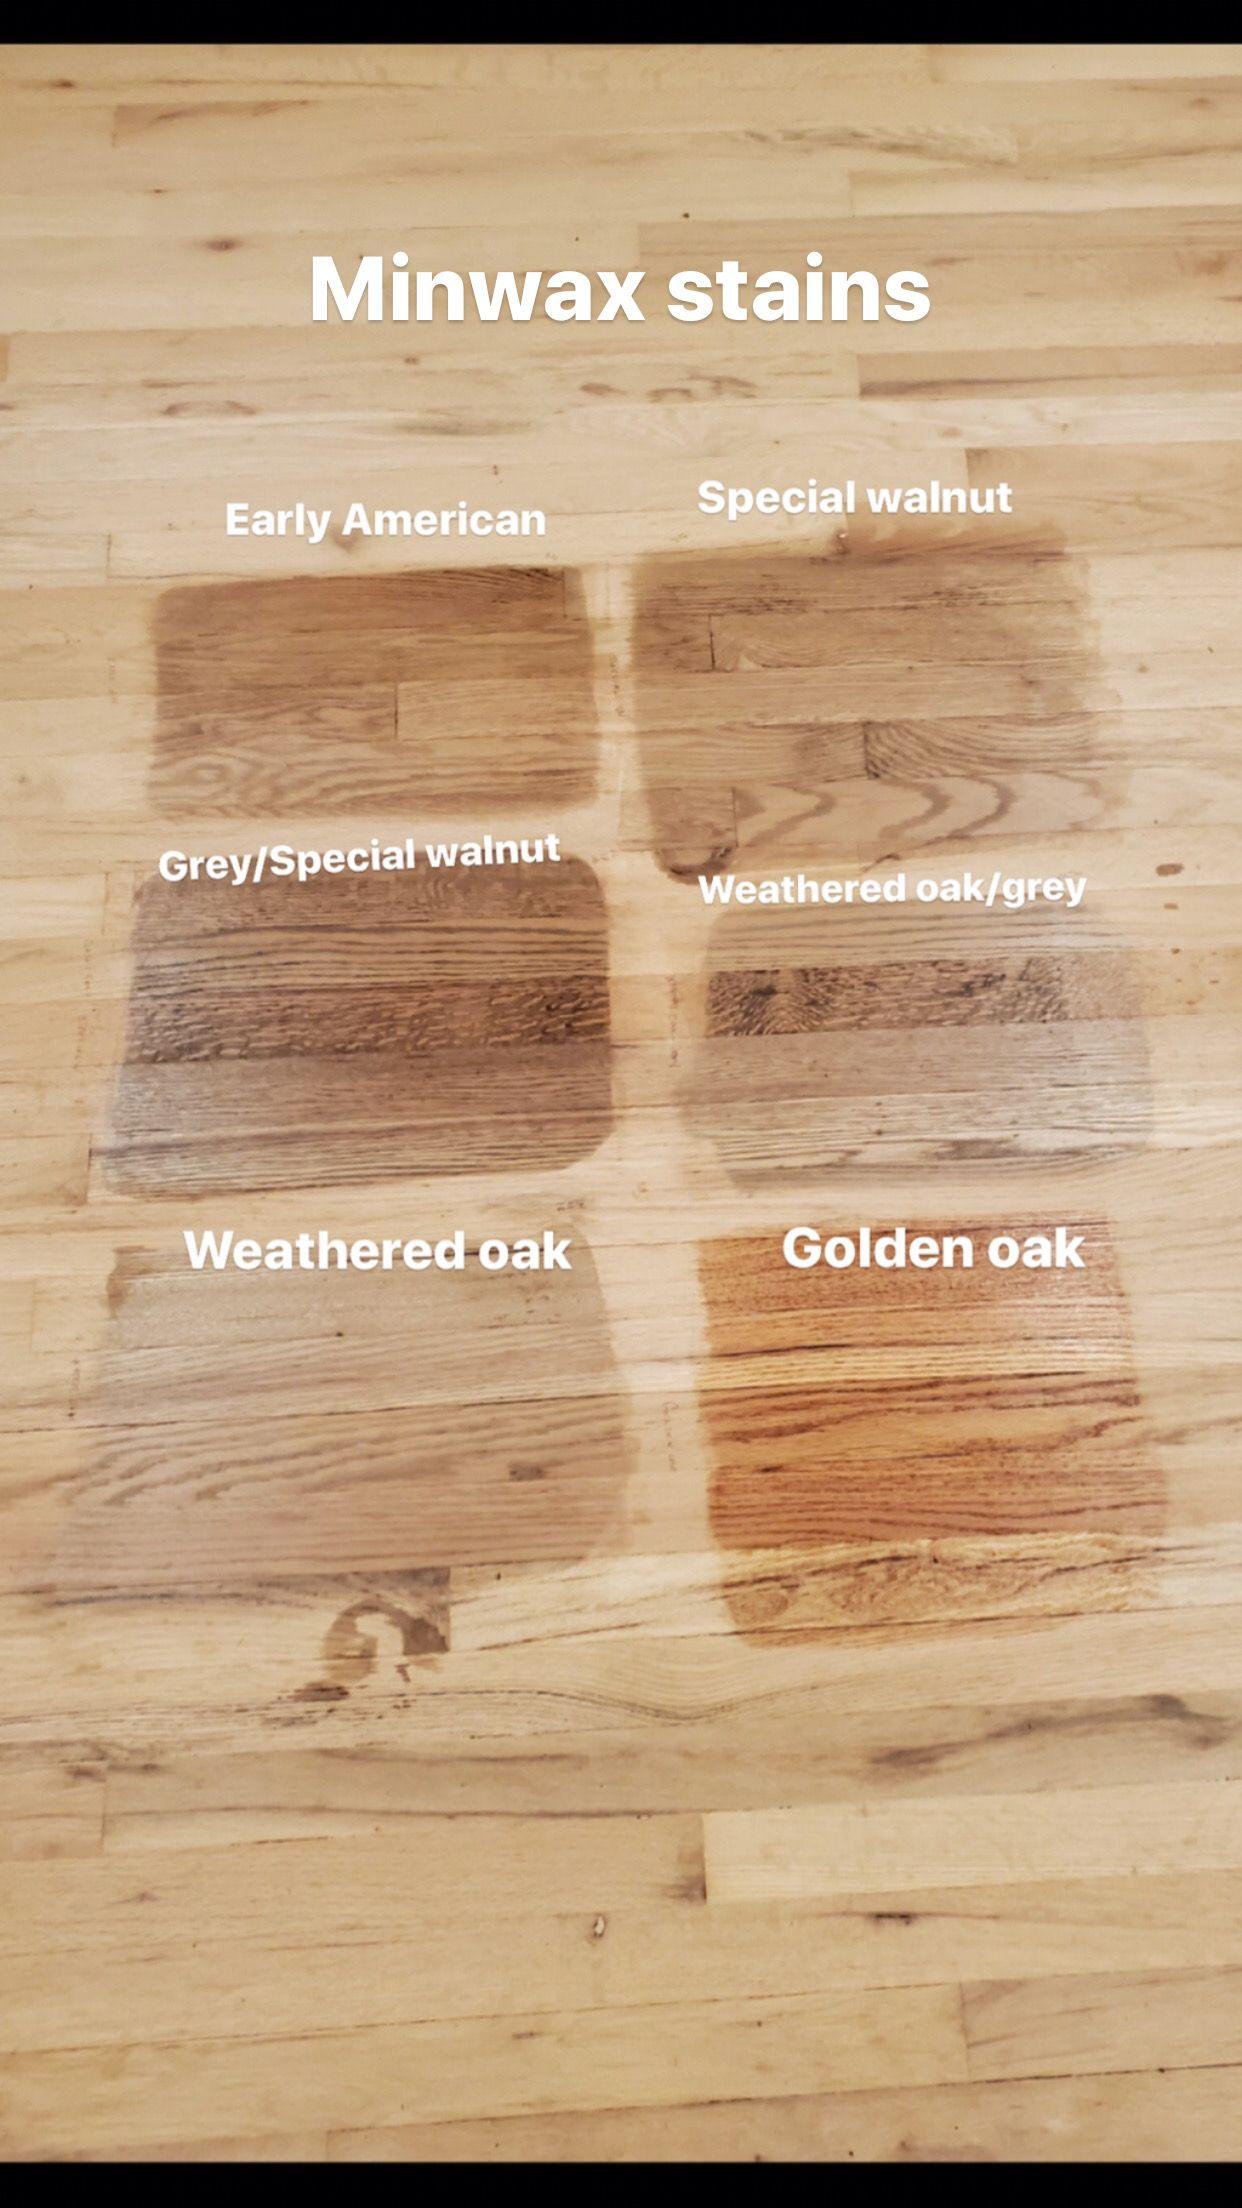 Minwax Hardwood Floor Stains Oak Floor Stains Weathered Oak Stain Hardwood Floor Stain Colors